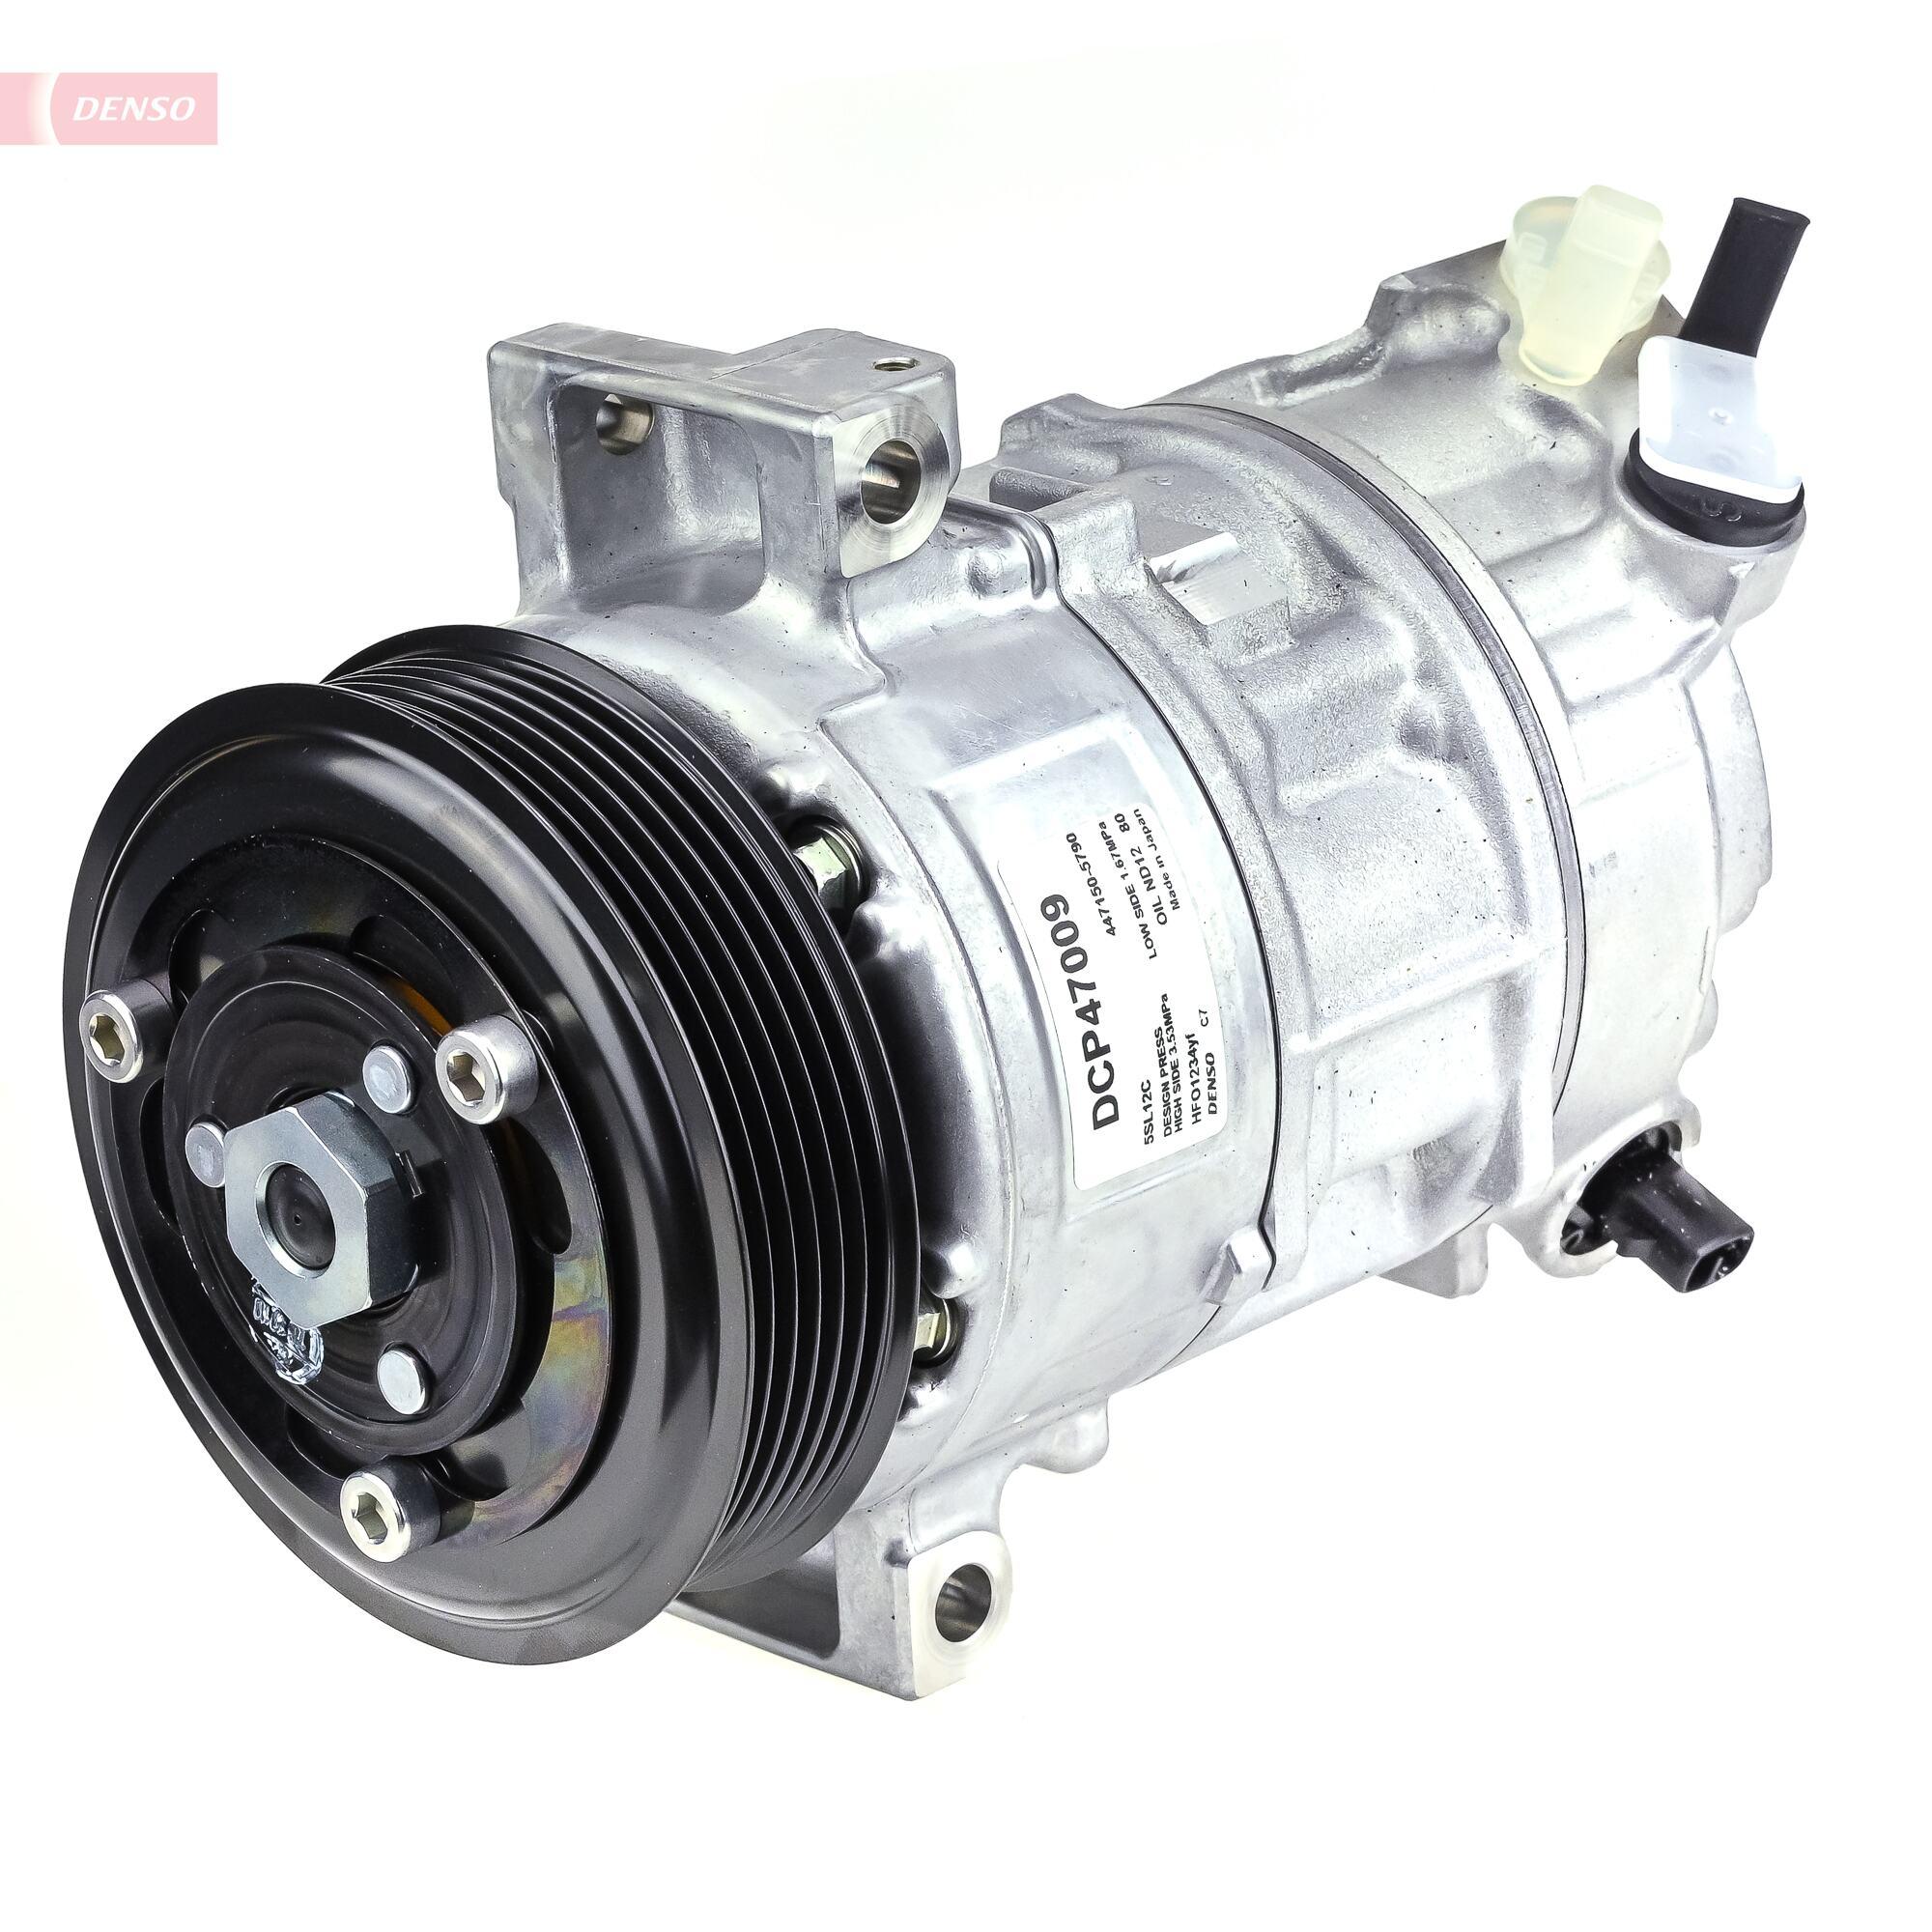 Kompresor klimatizace DENSO DCP47009